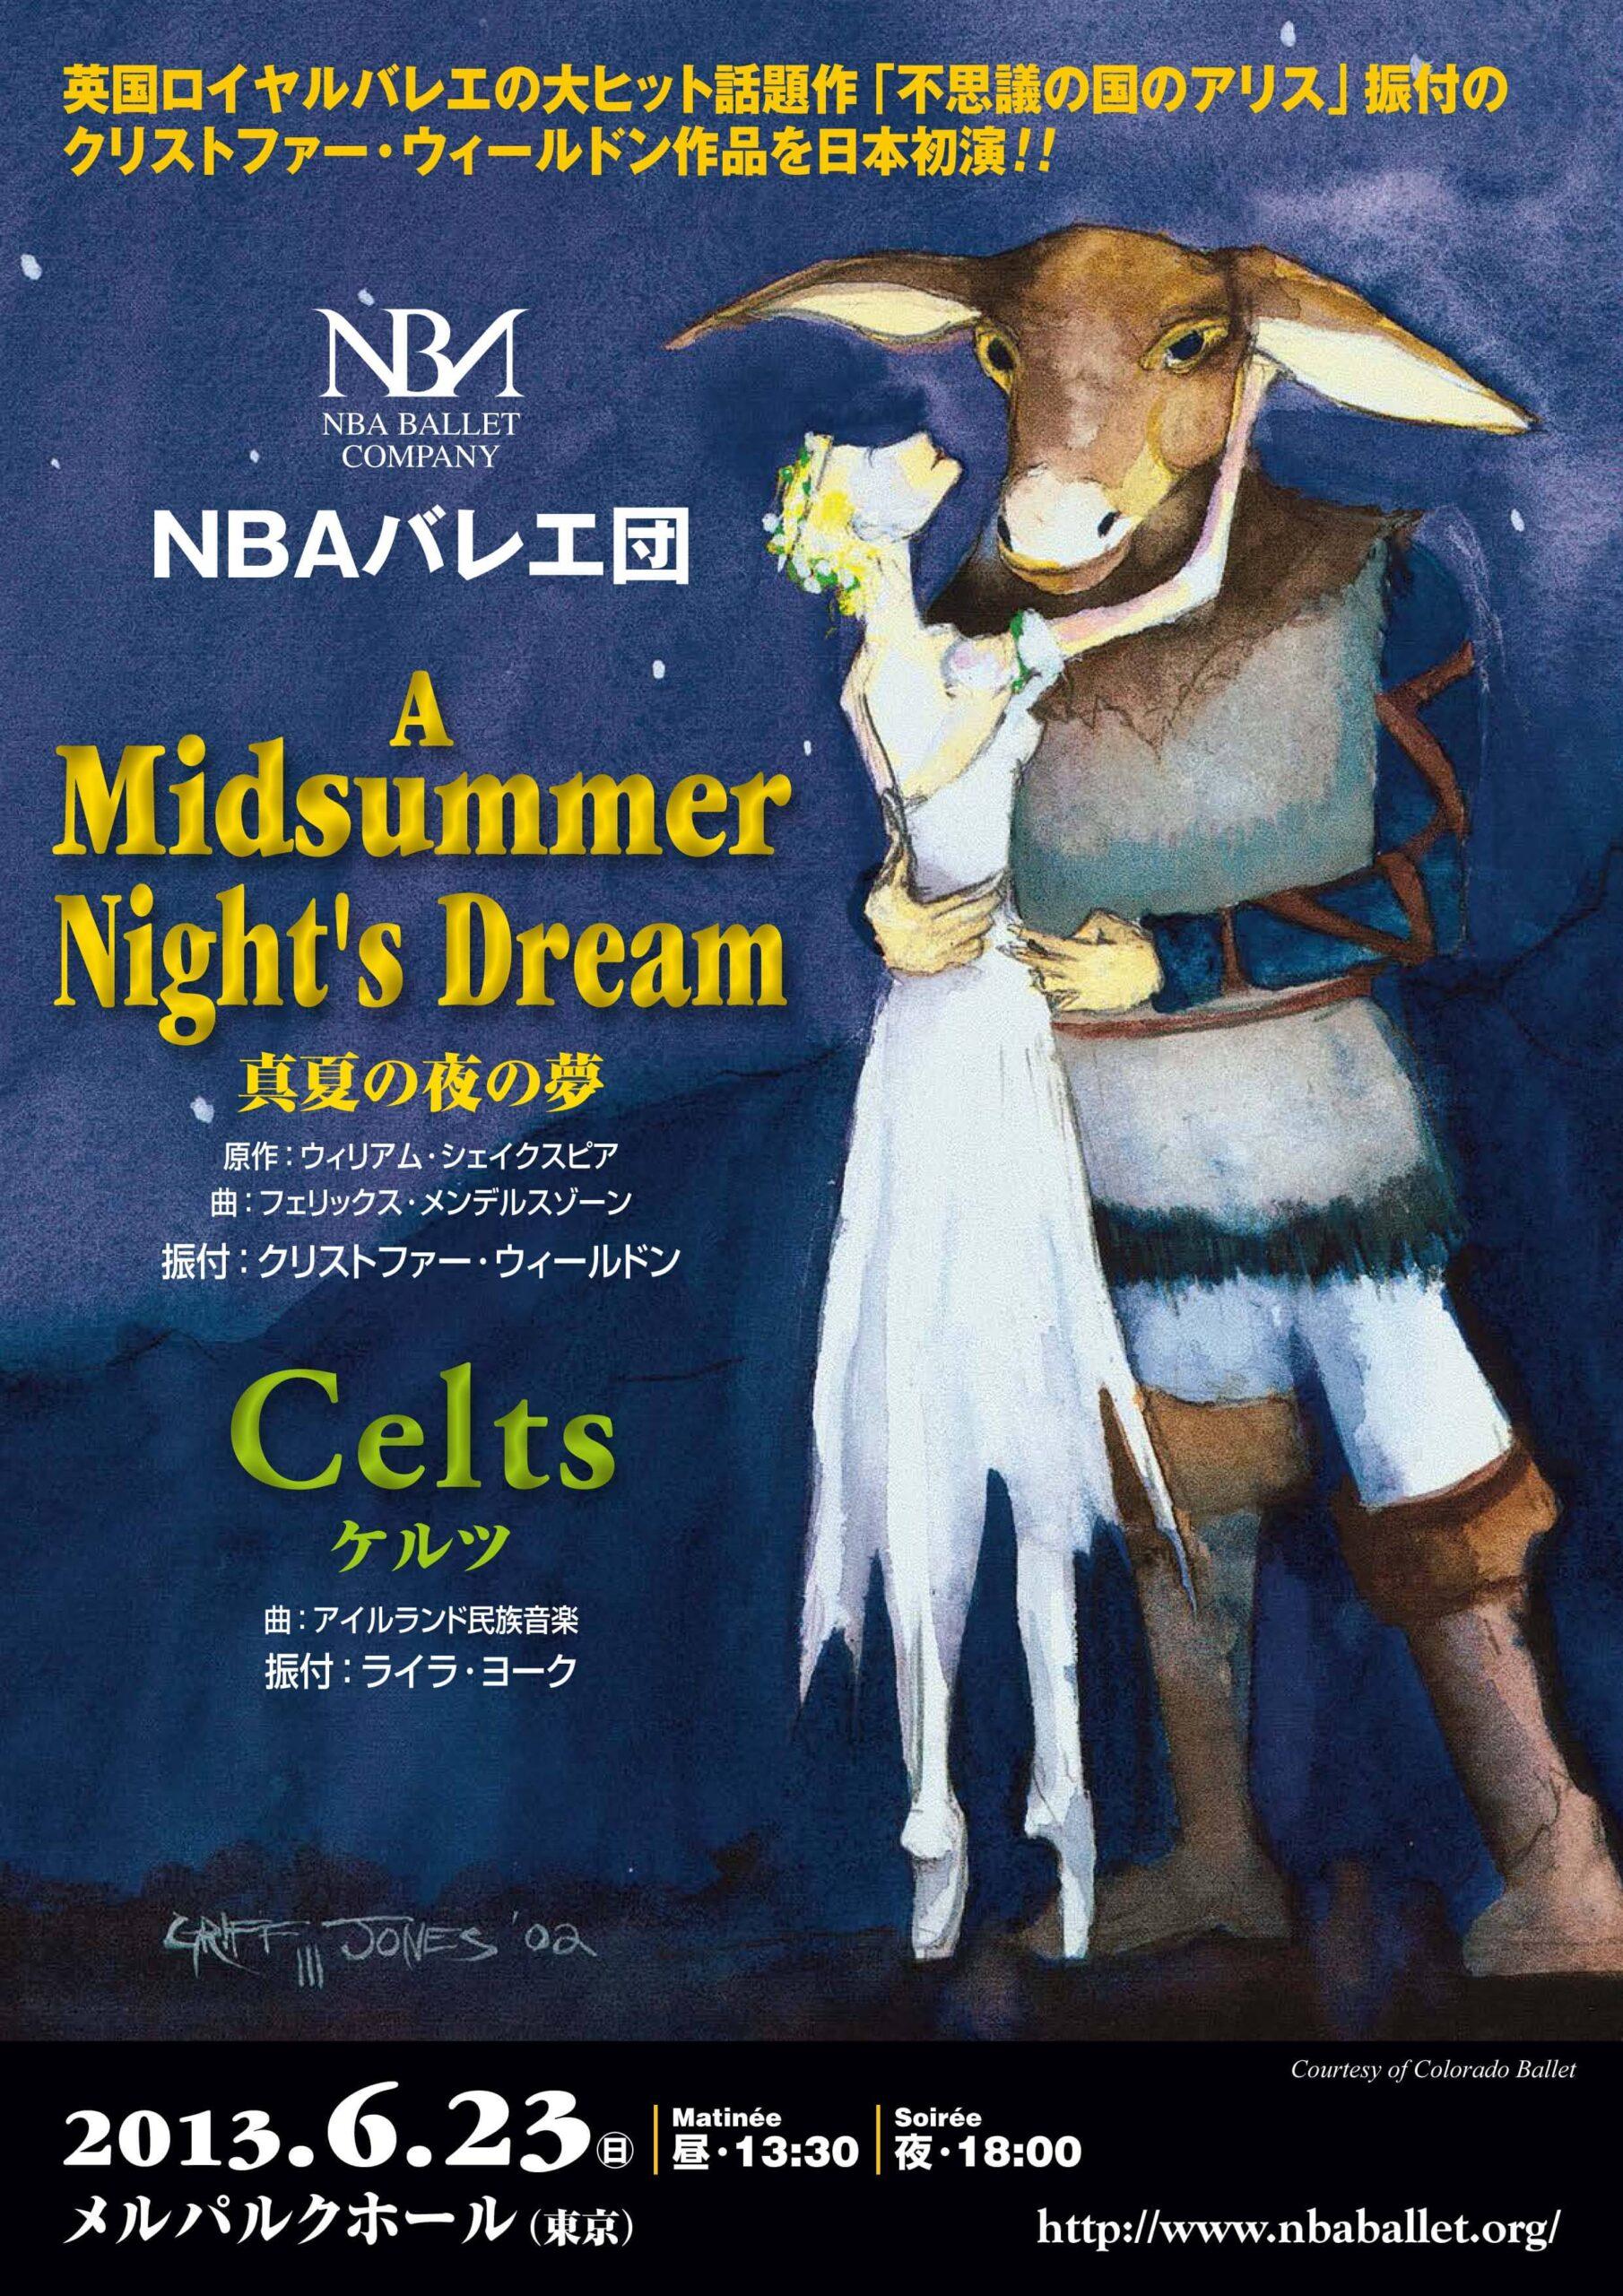 NBAバレエ団公演 A Midsummer Night's Dream 真夏の夜の夢